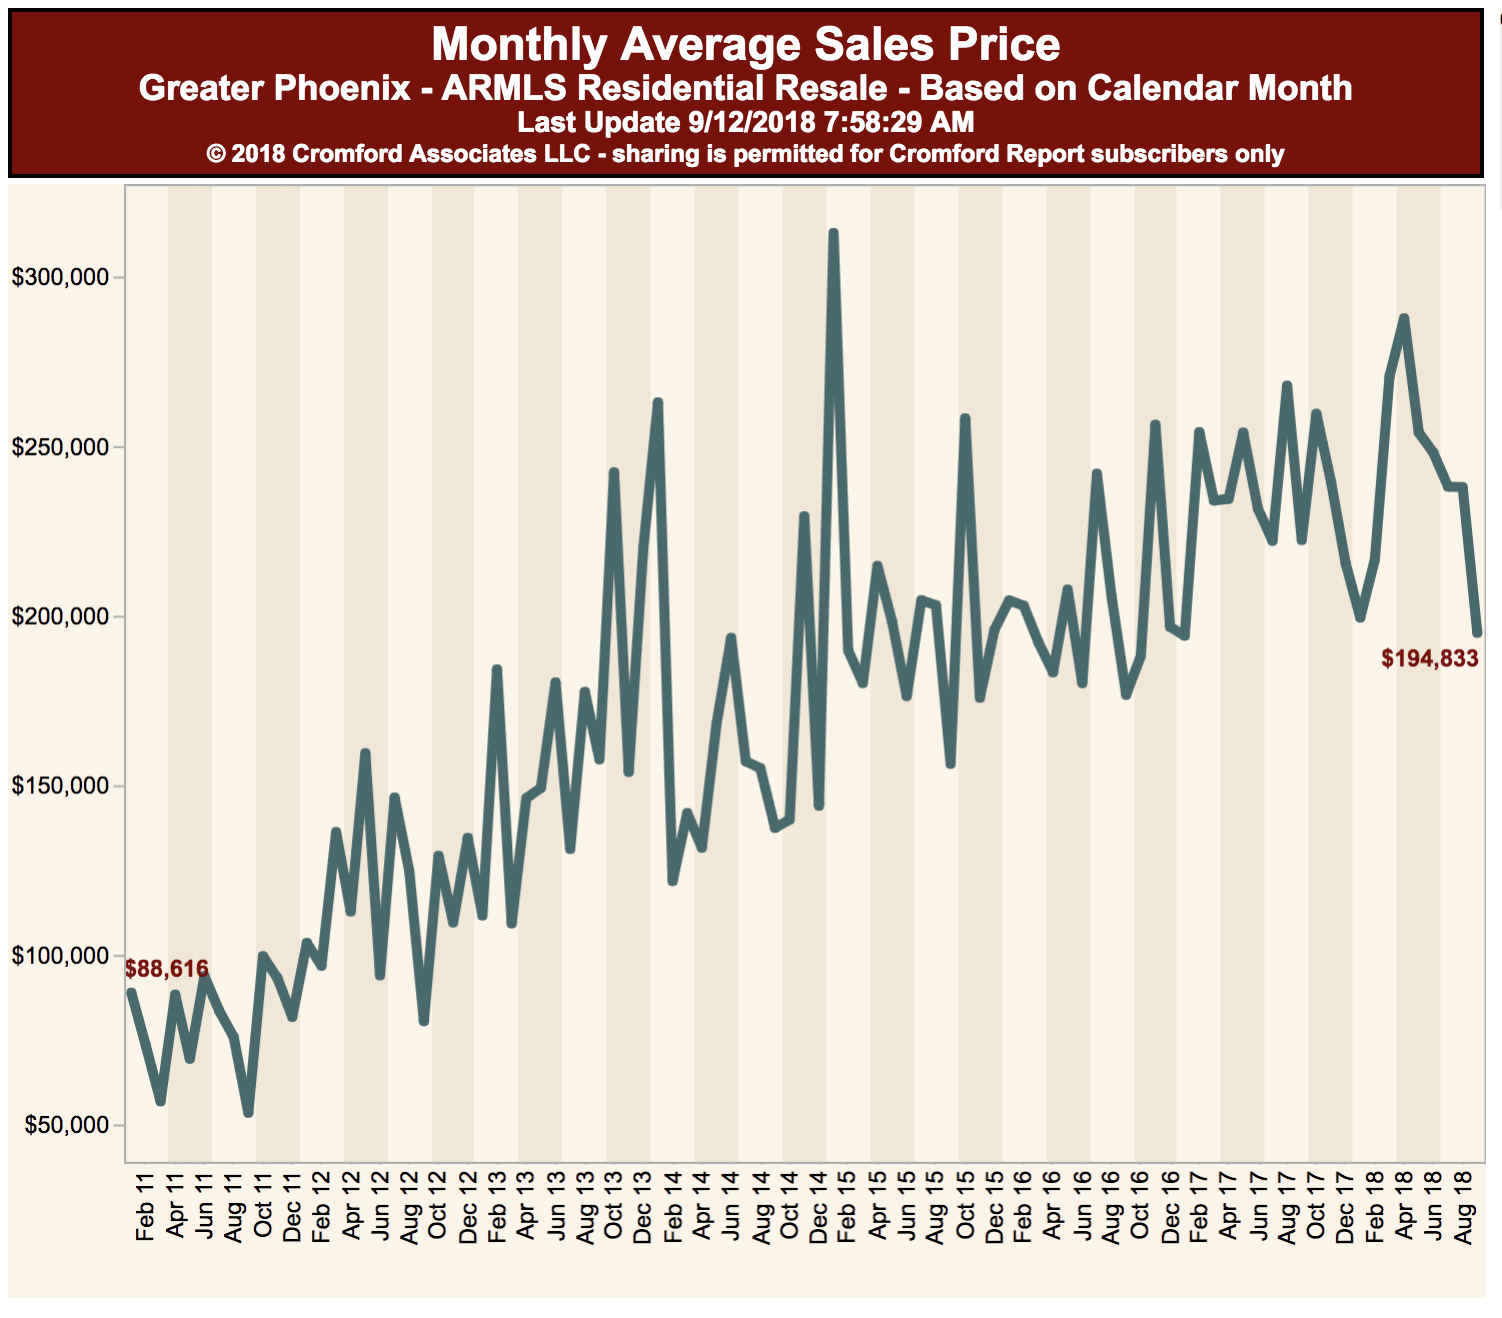 85018 condo average sales price Aug 2017 - 18